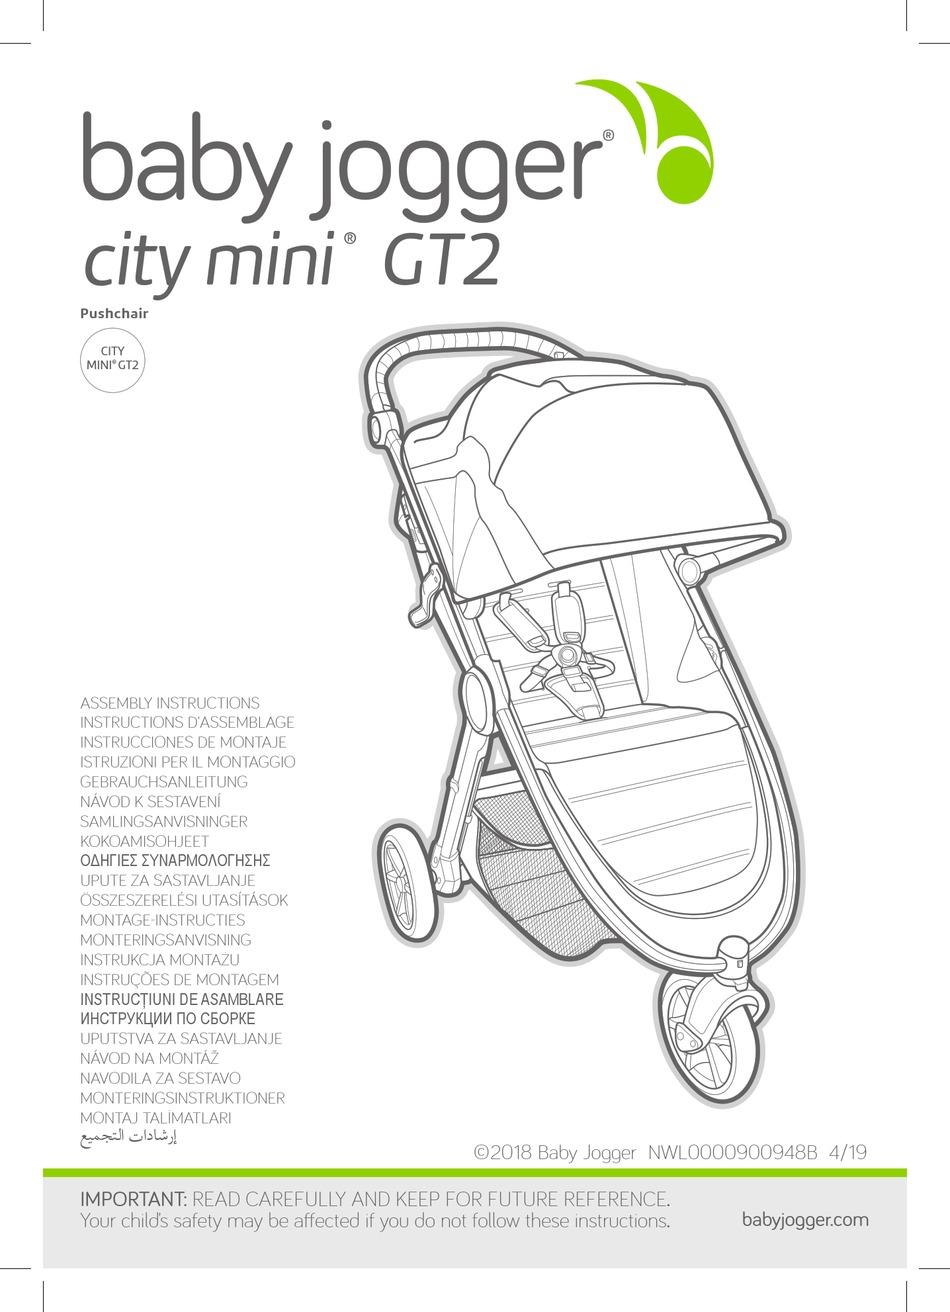 BABY JOGGER CITY MINI GT2 ASSEMBLY INSTRUCTIONS MANUAL Pdf